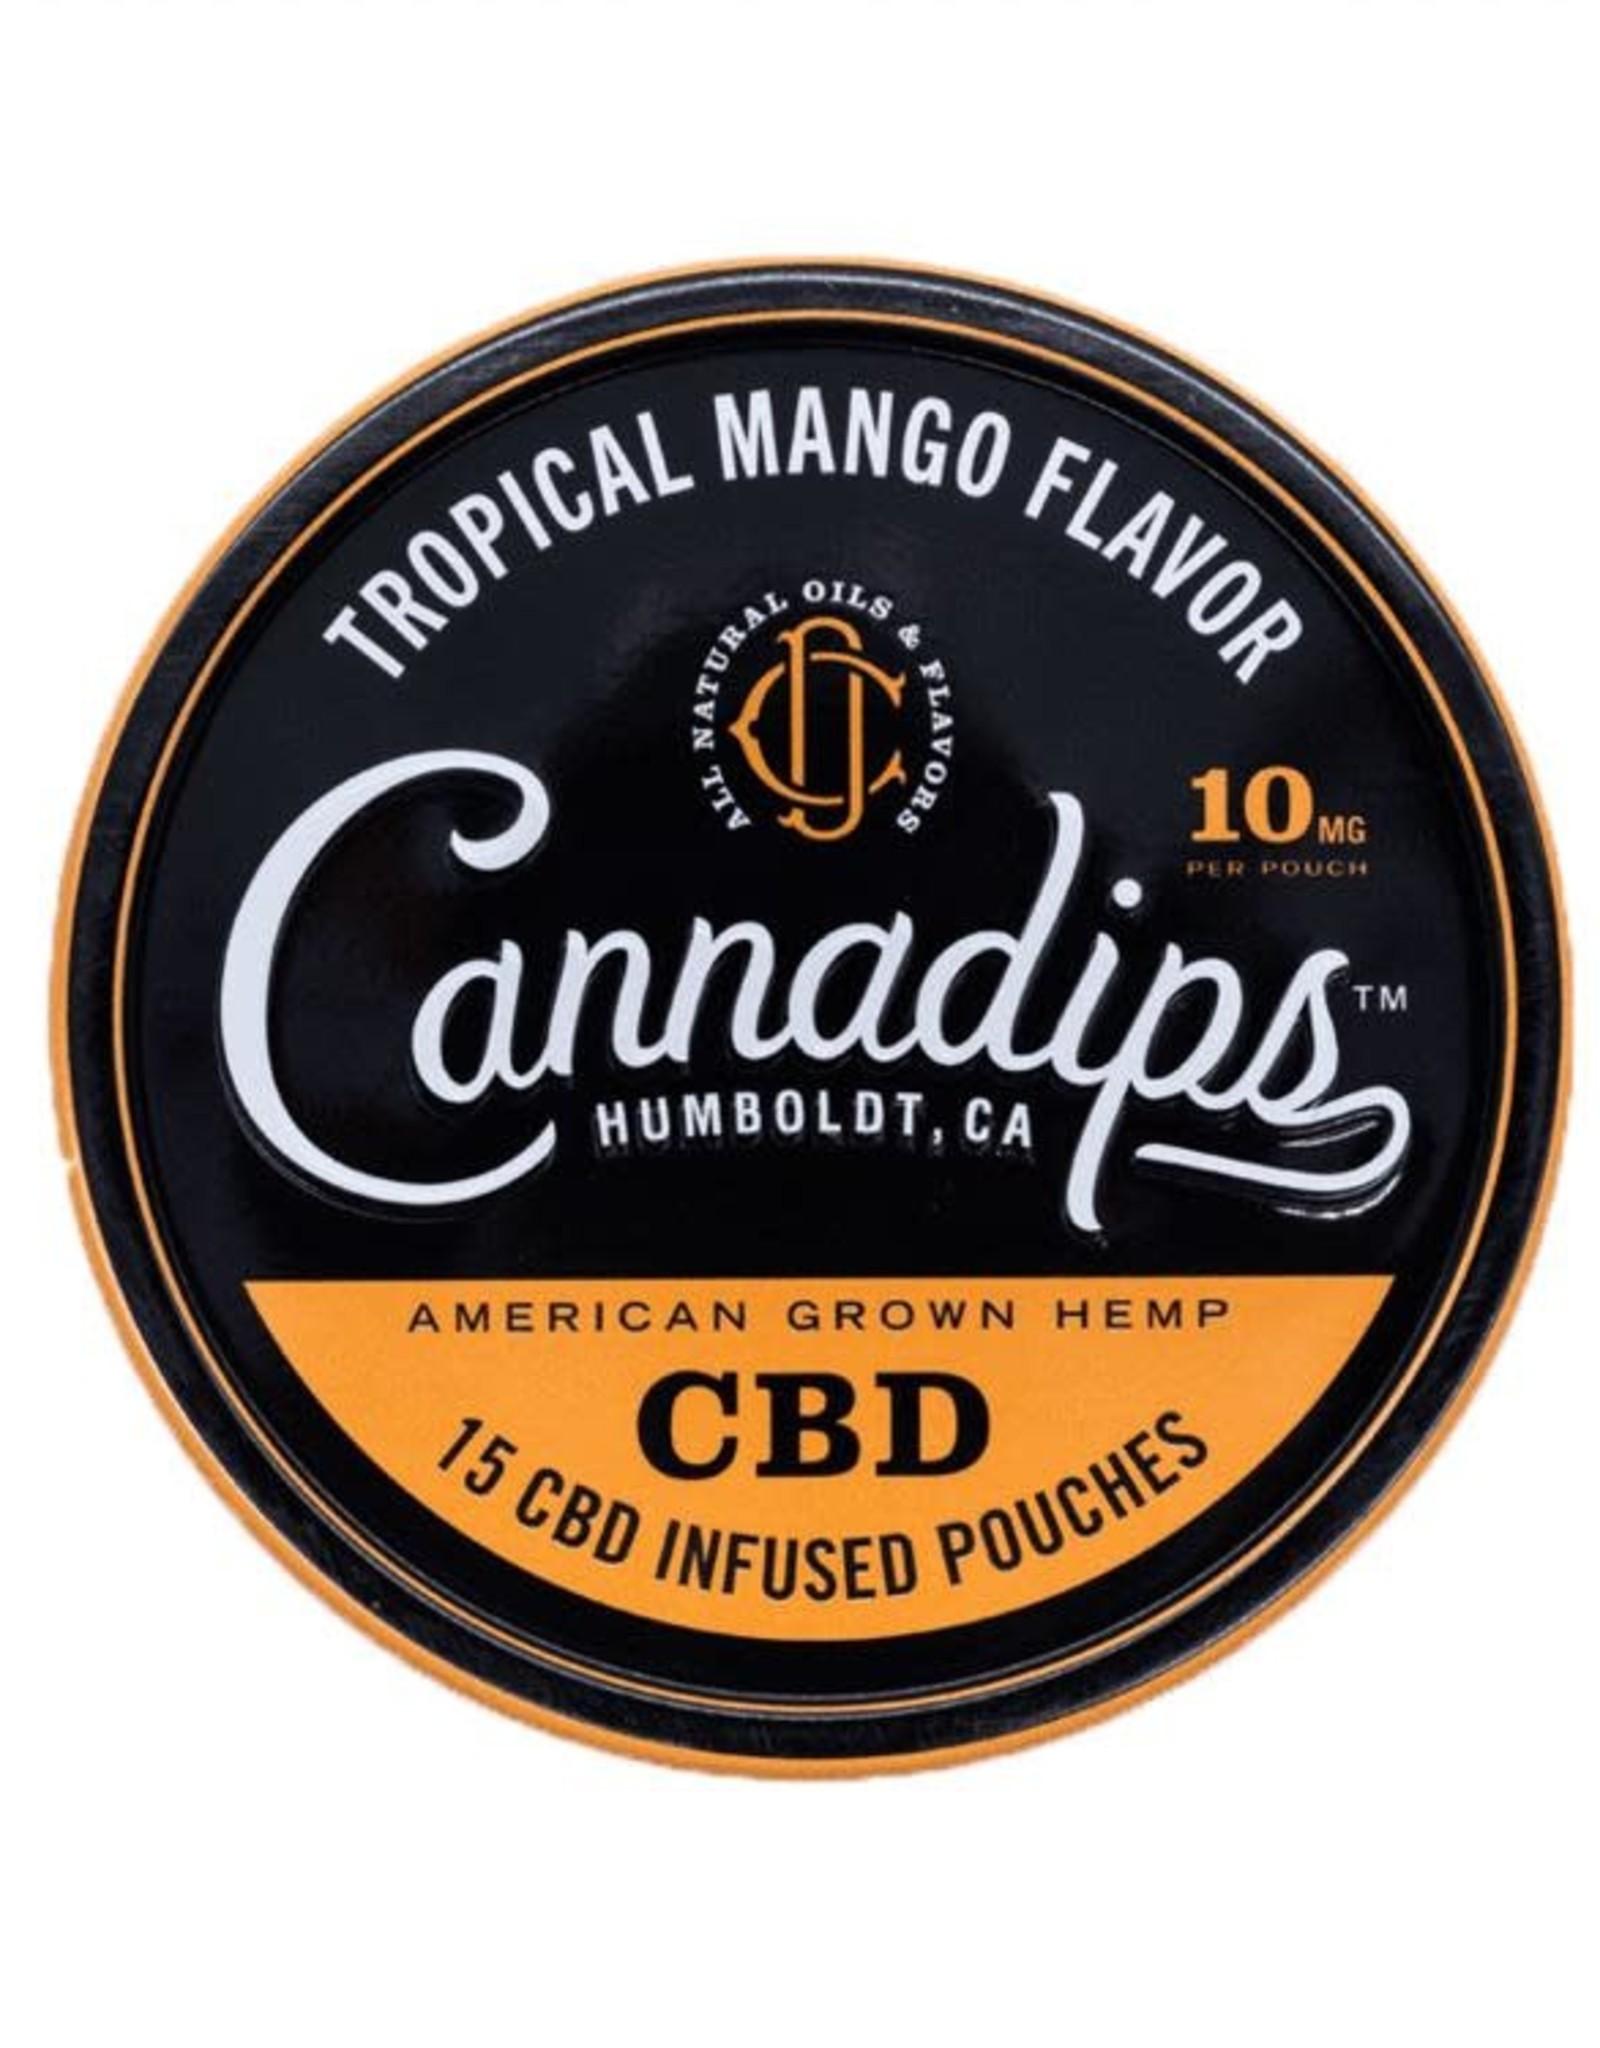 Cannadips CBD Pouches